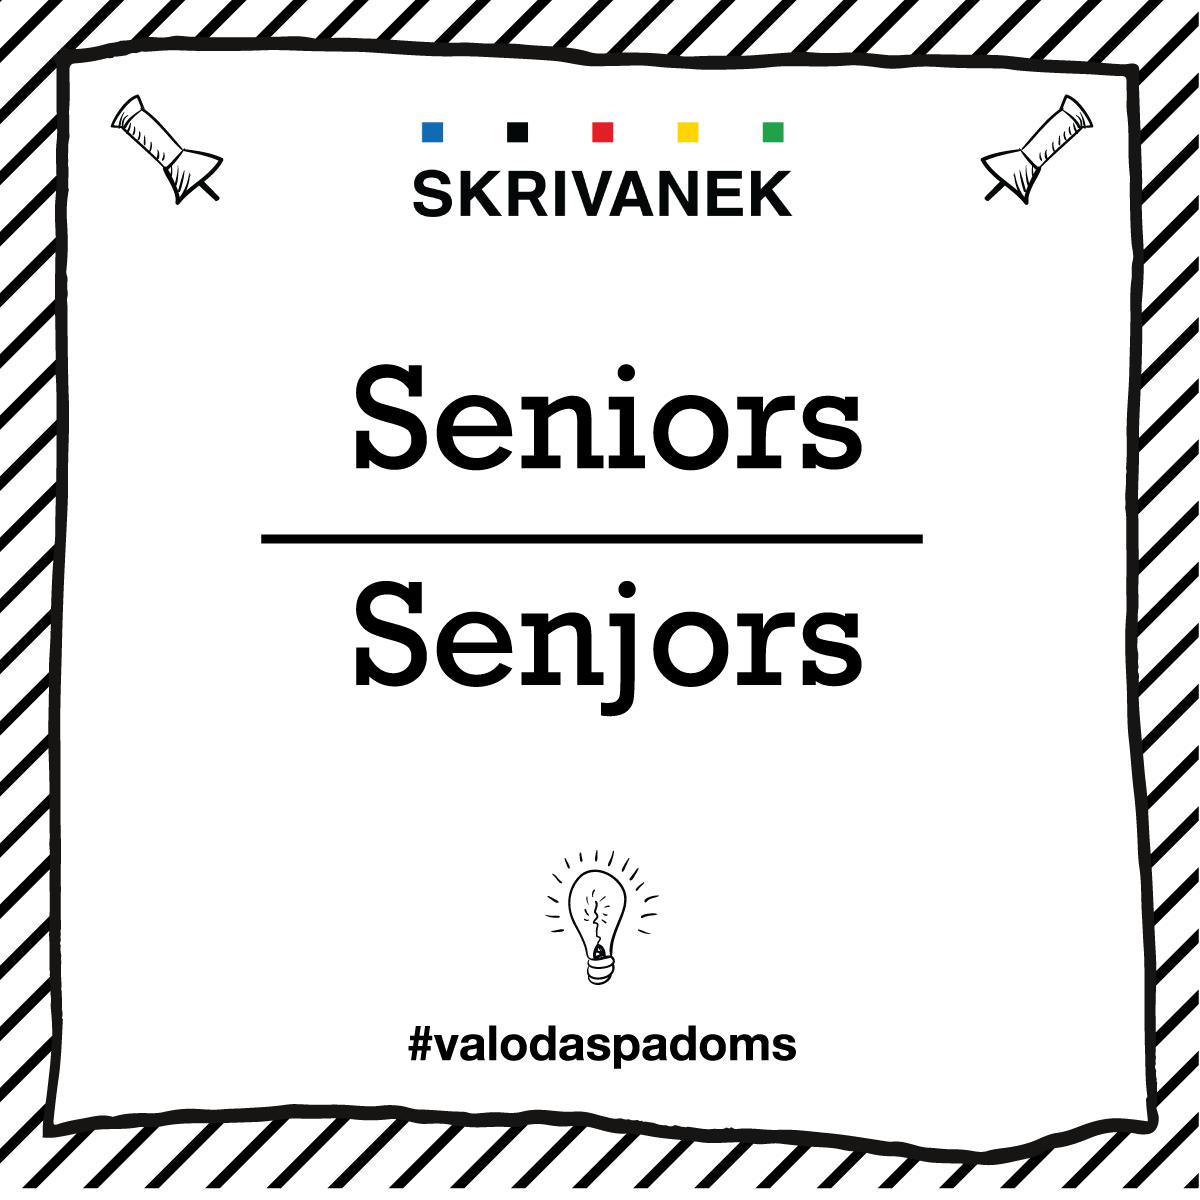 "Skrivanek Baltic valodas padoms ""Seniors"" pret ""Senjors"""